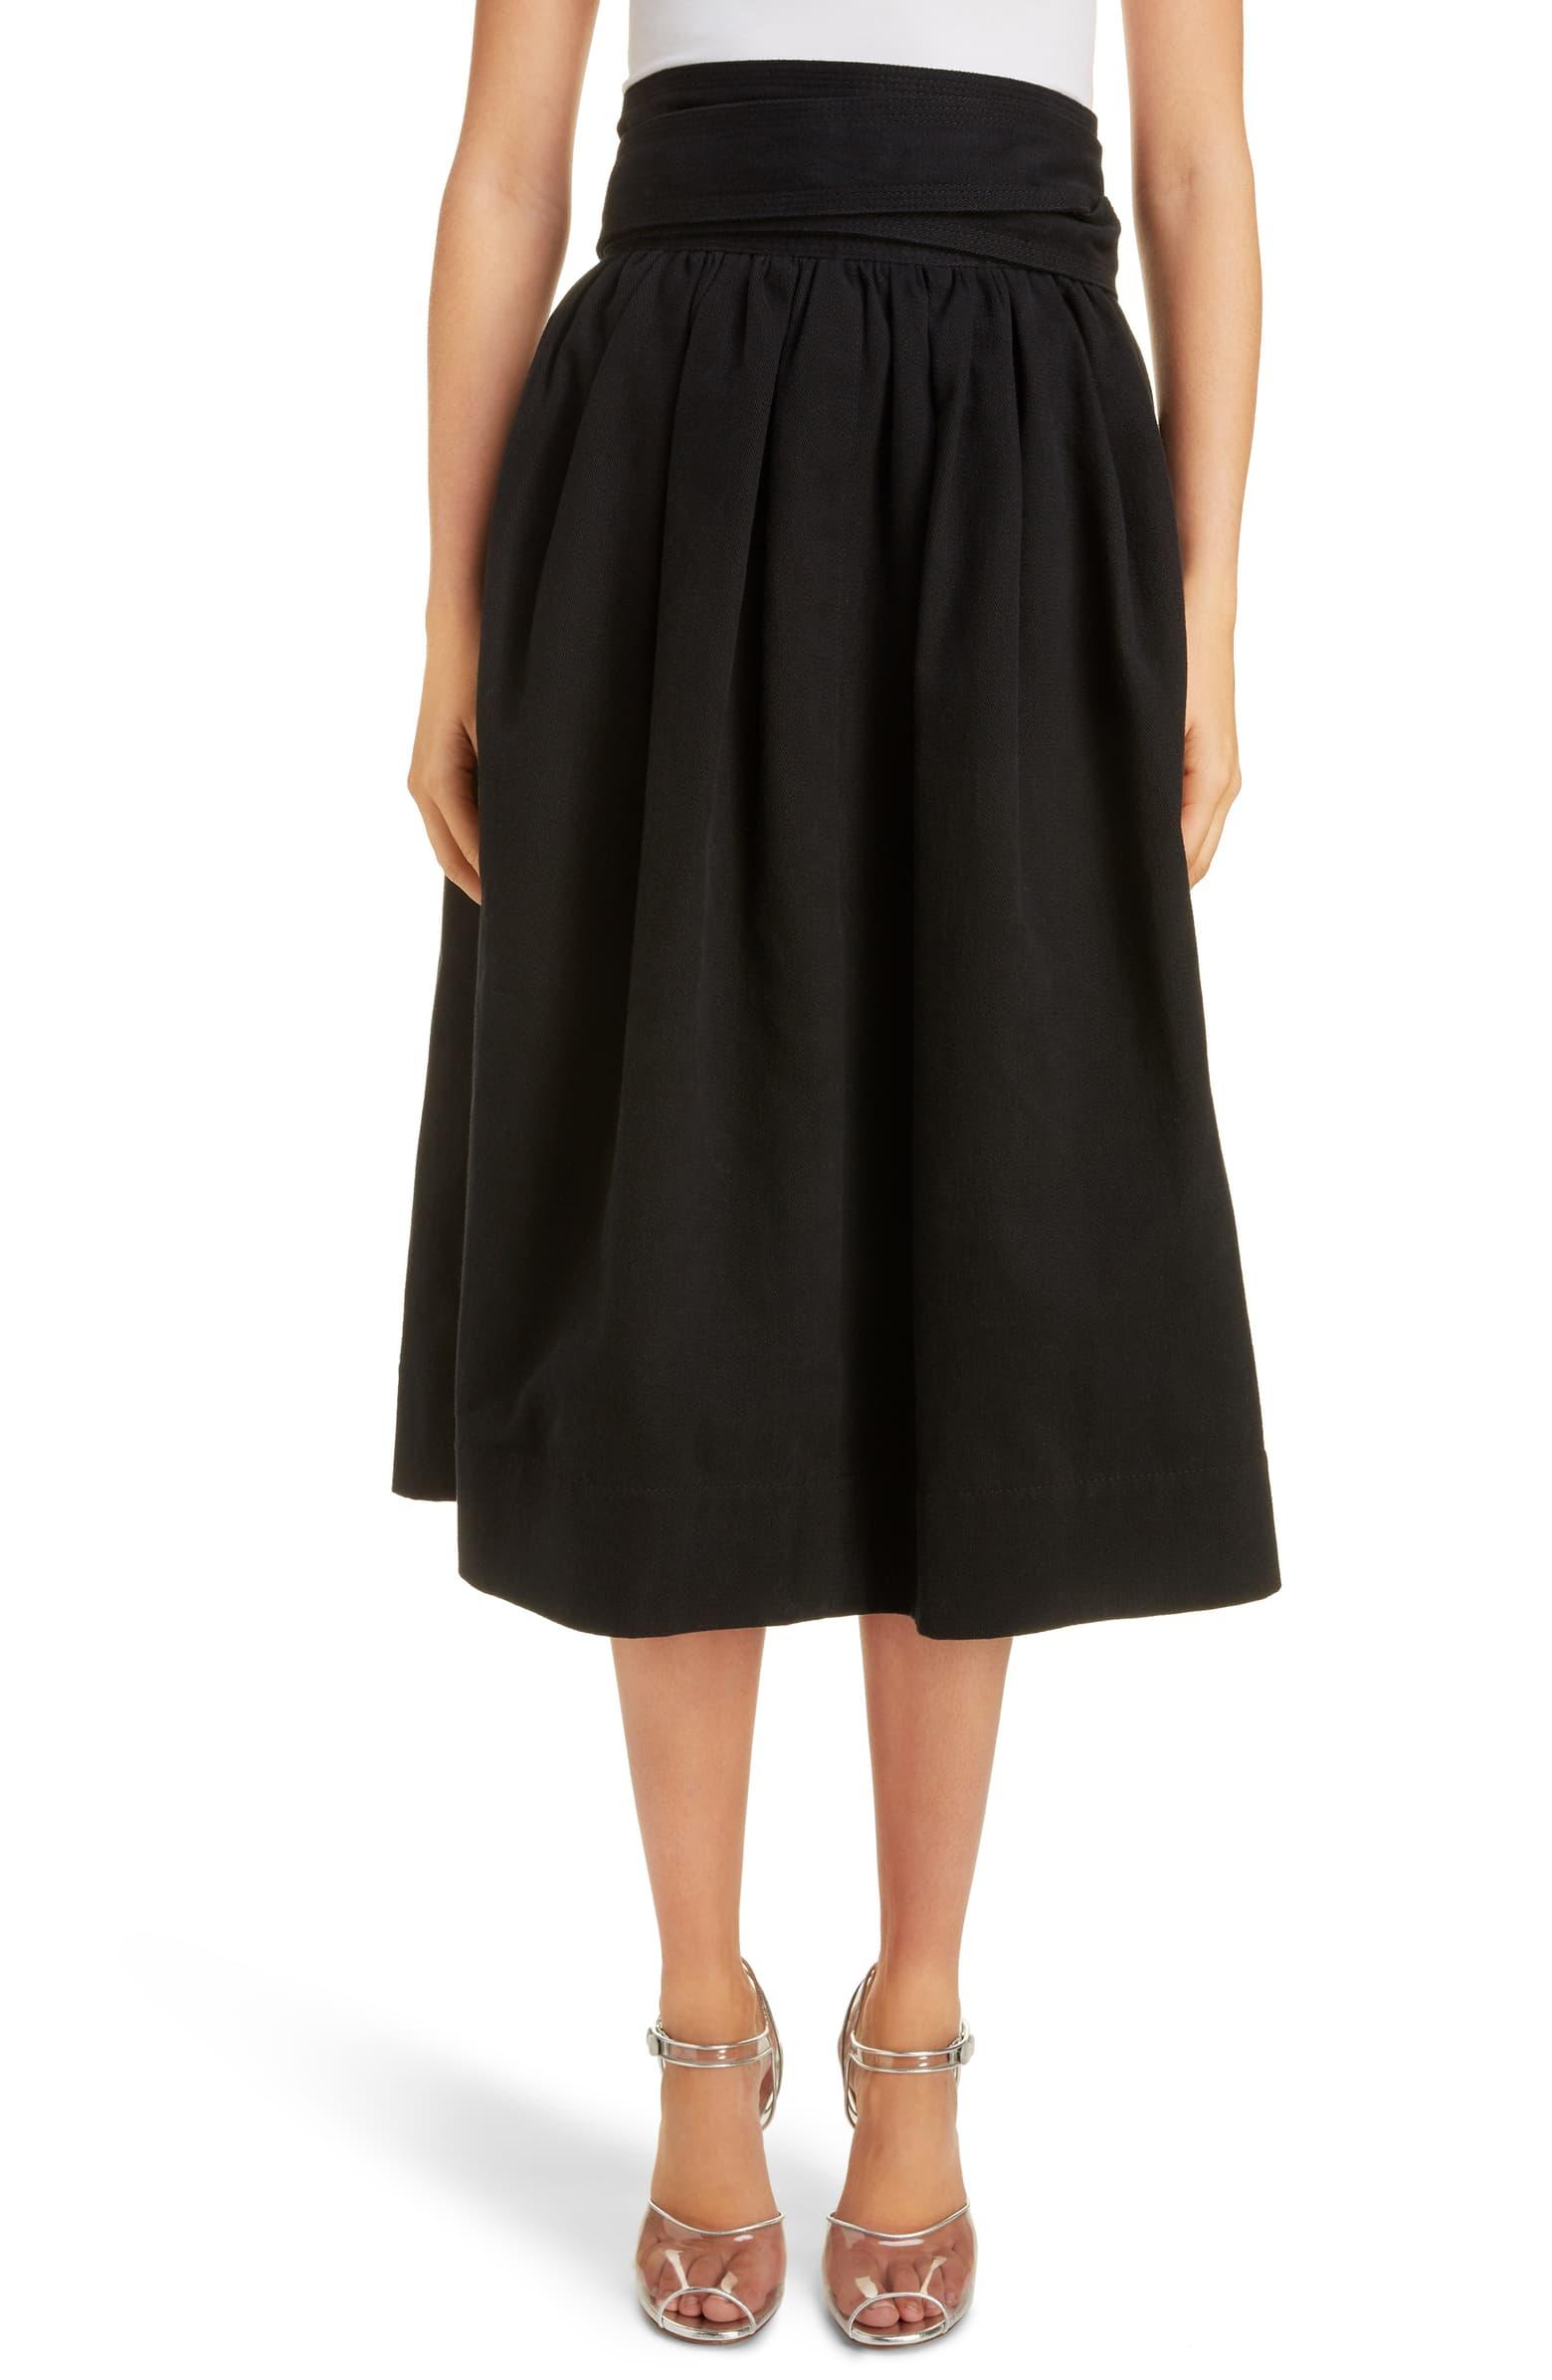 high-waisted-skirts-denim-skirt-nordstrom.jpeg